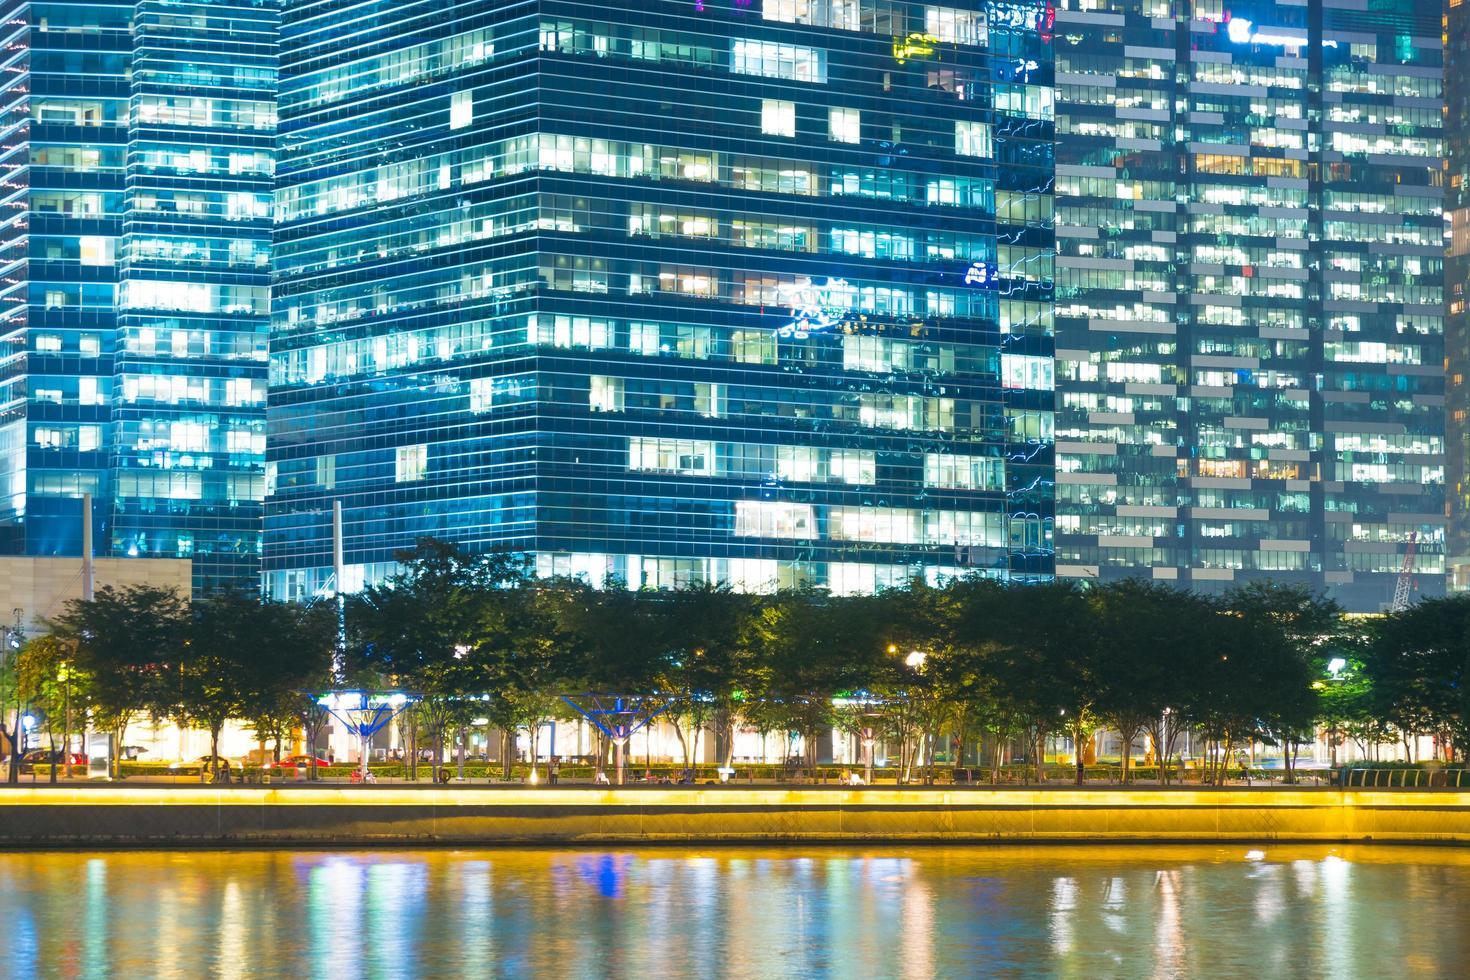 waterkant in de stad Singapore foto